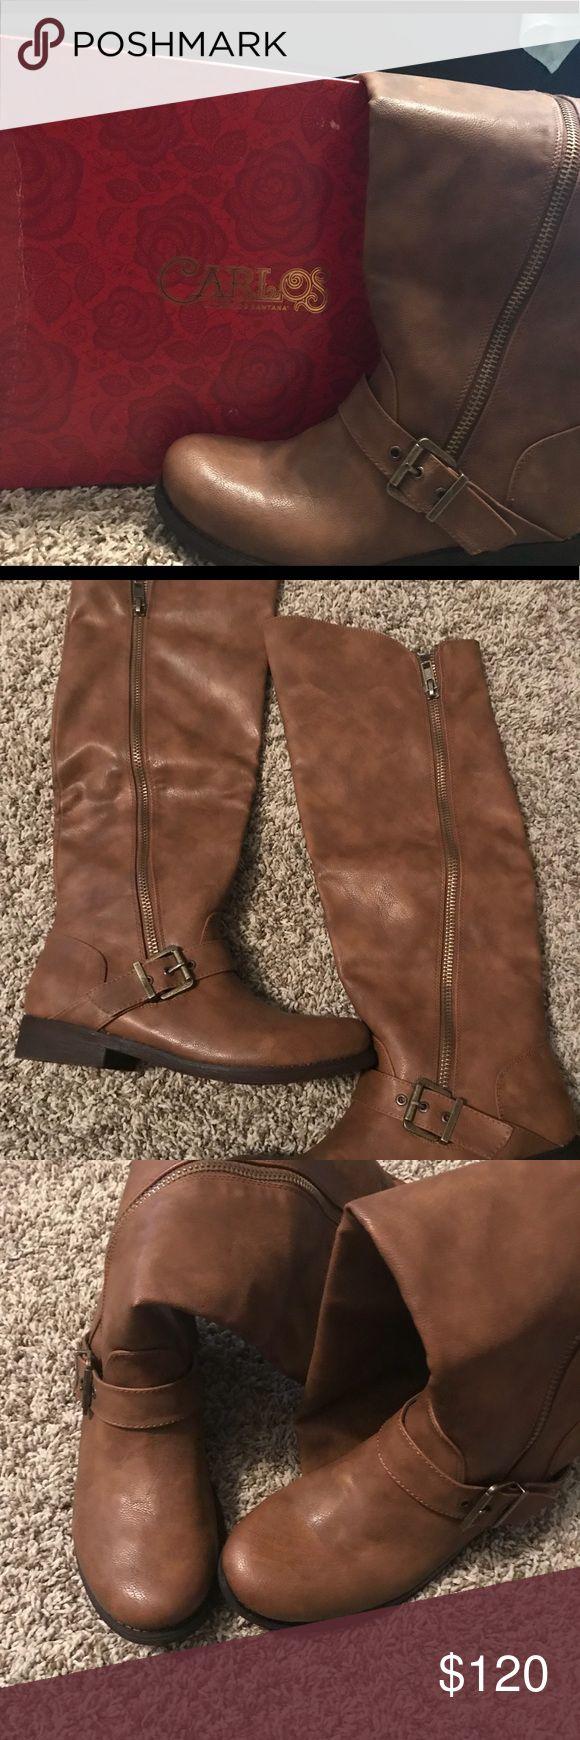 Carlos Santana boots size 8 New Carlos Santana boots size 8 adorable 💕 Carlos Santana Shoes